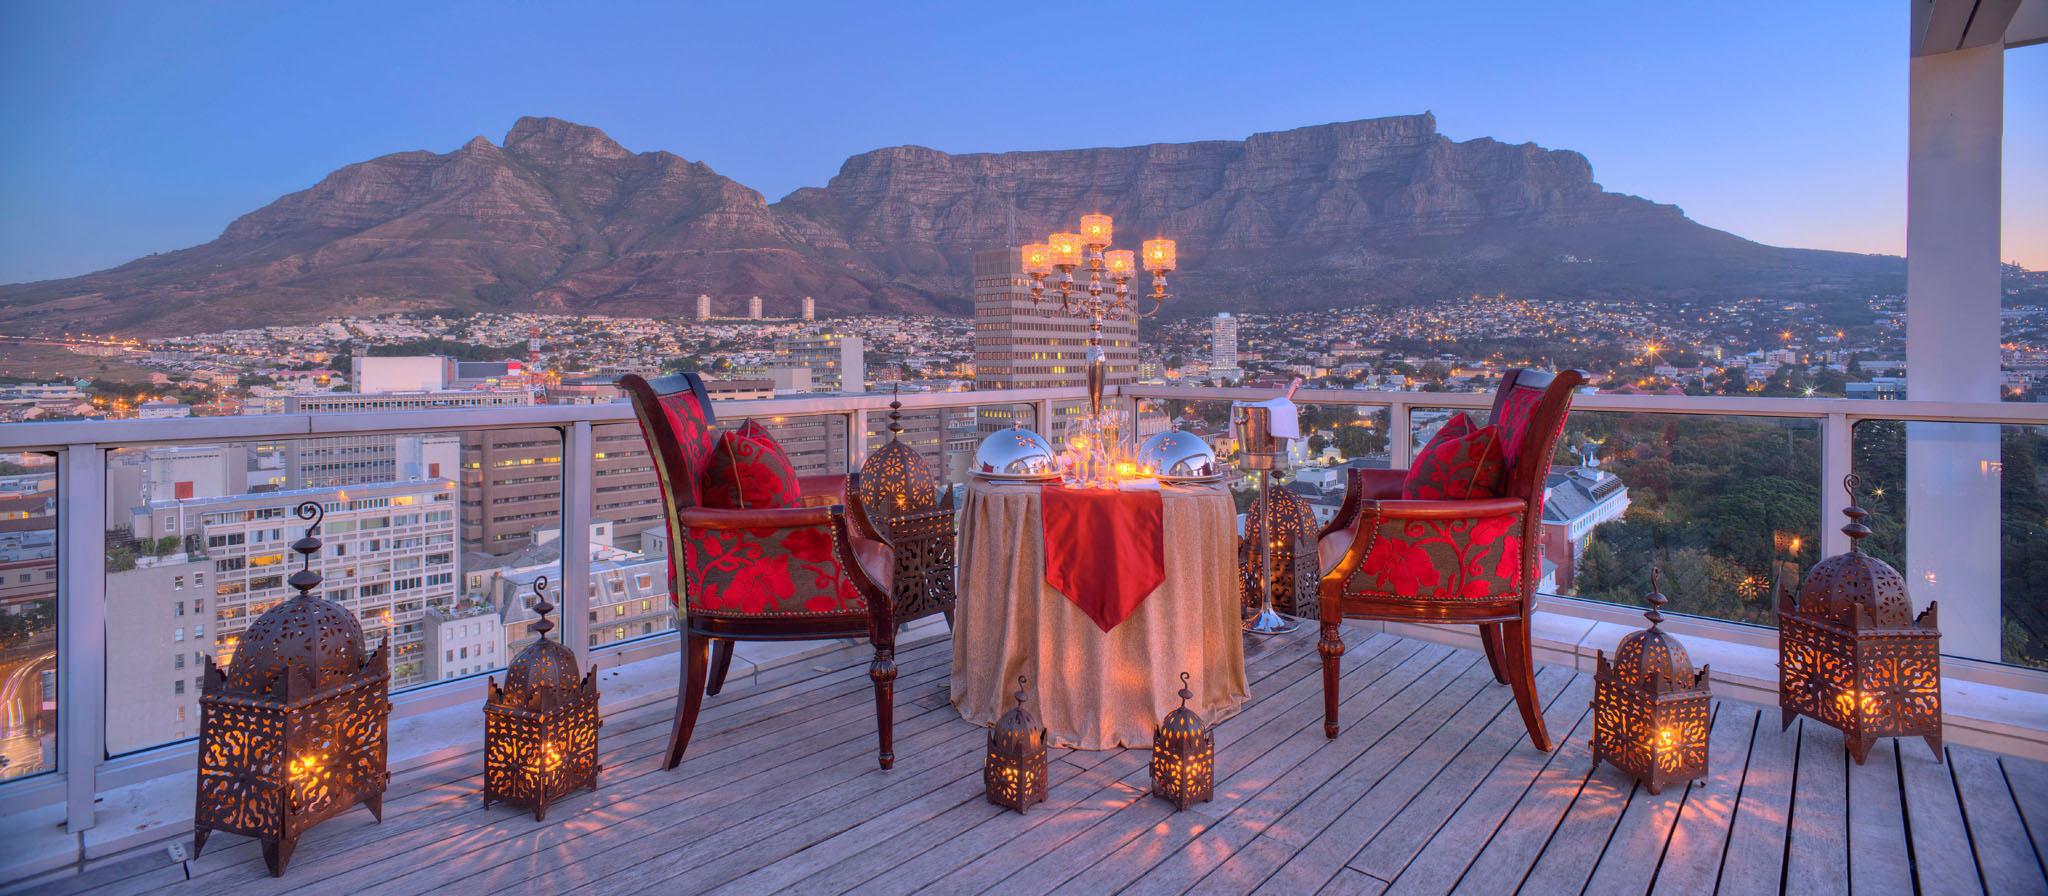 Luxury Hotel In Cape Town